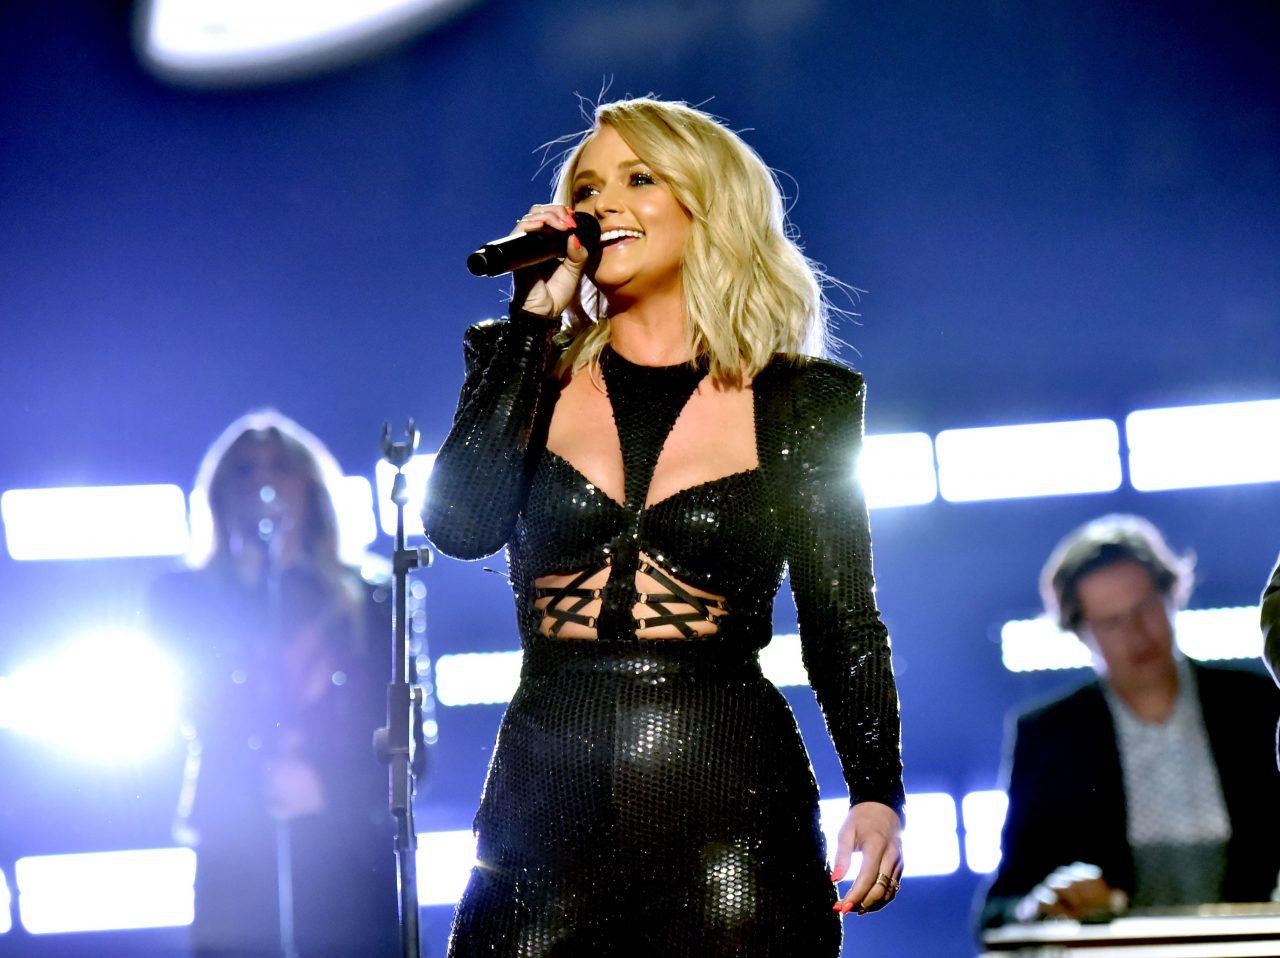 Miranda Lambert Dishes on New Music Set to Debut This Summer